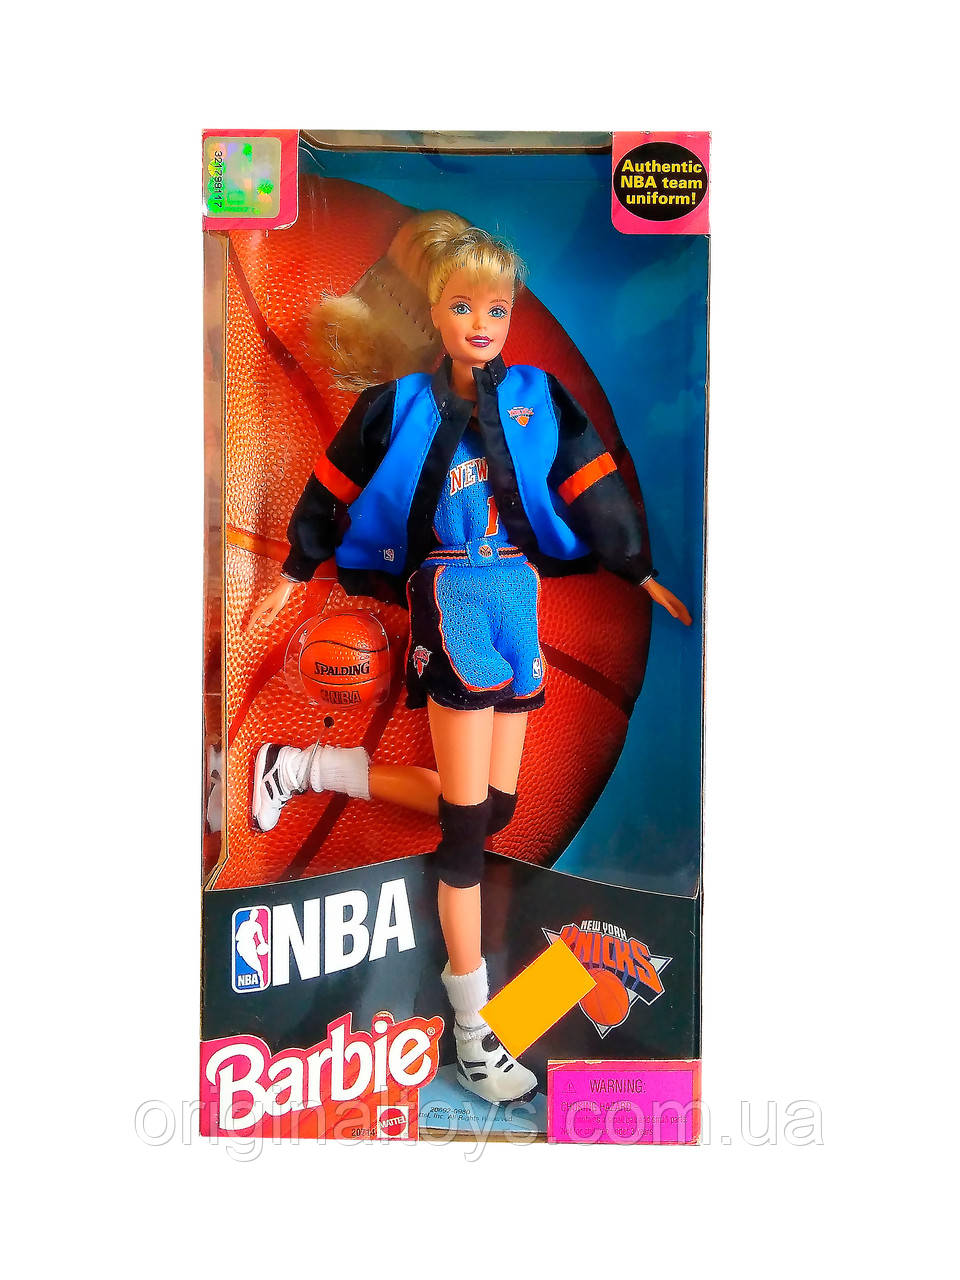 Коллекционная кукла Барби Barbie NBA New York Knicks 1998 Mattel 20714